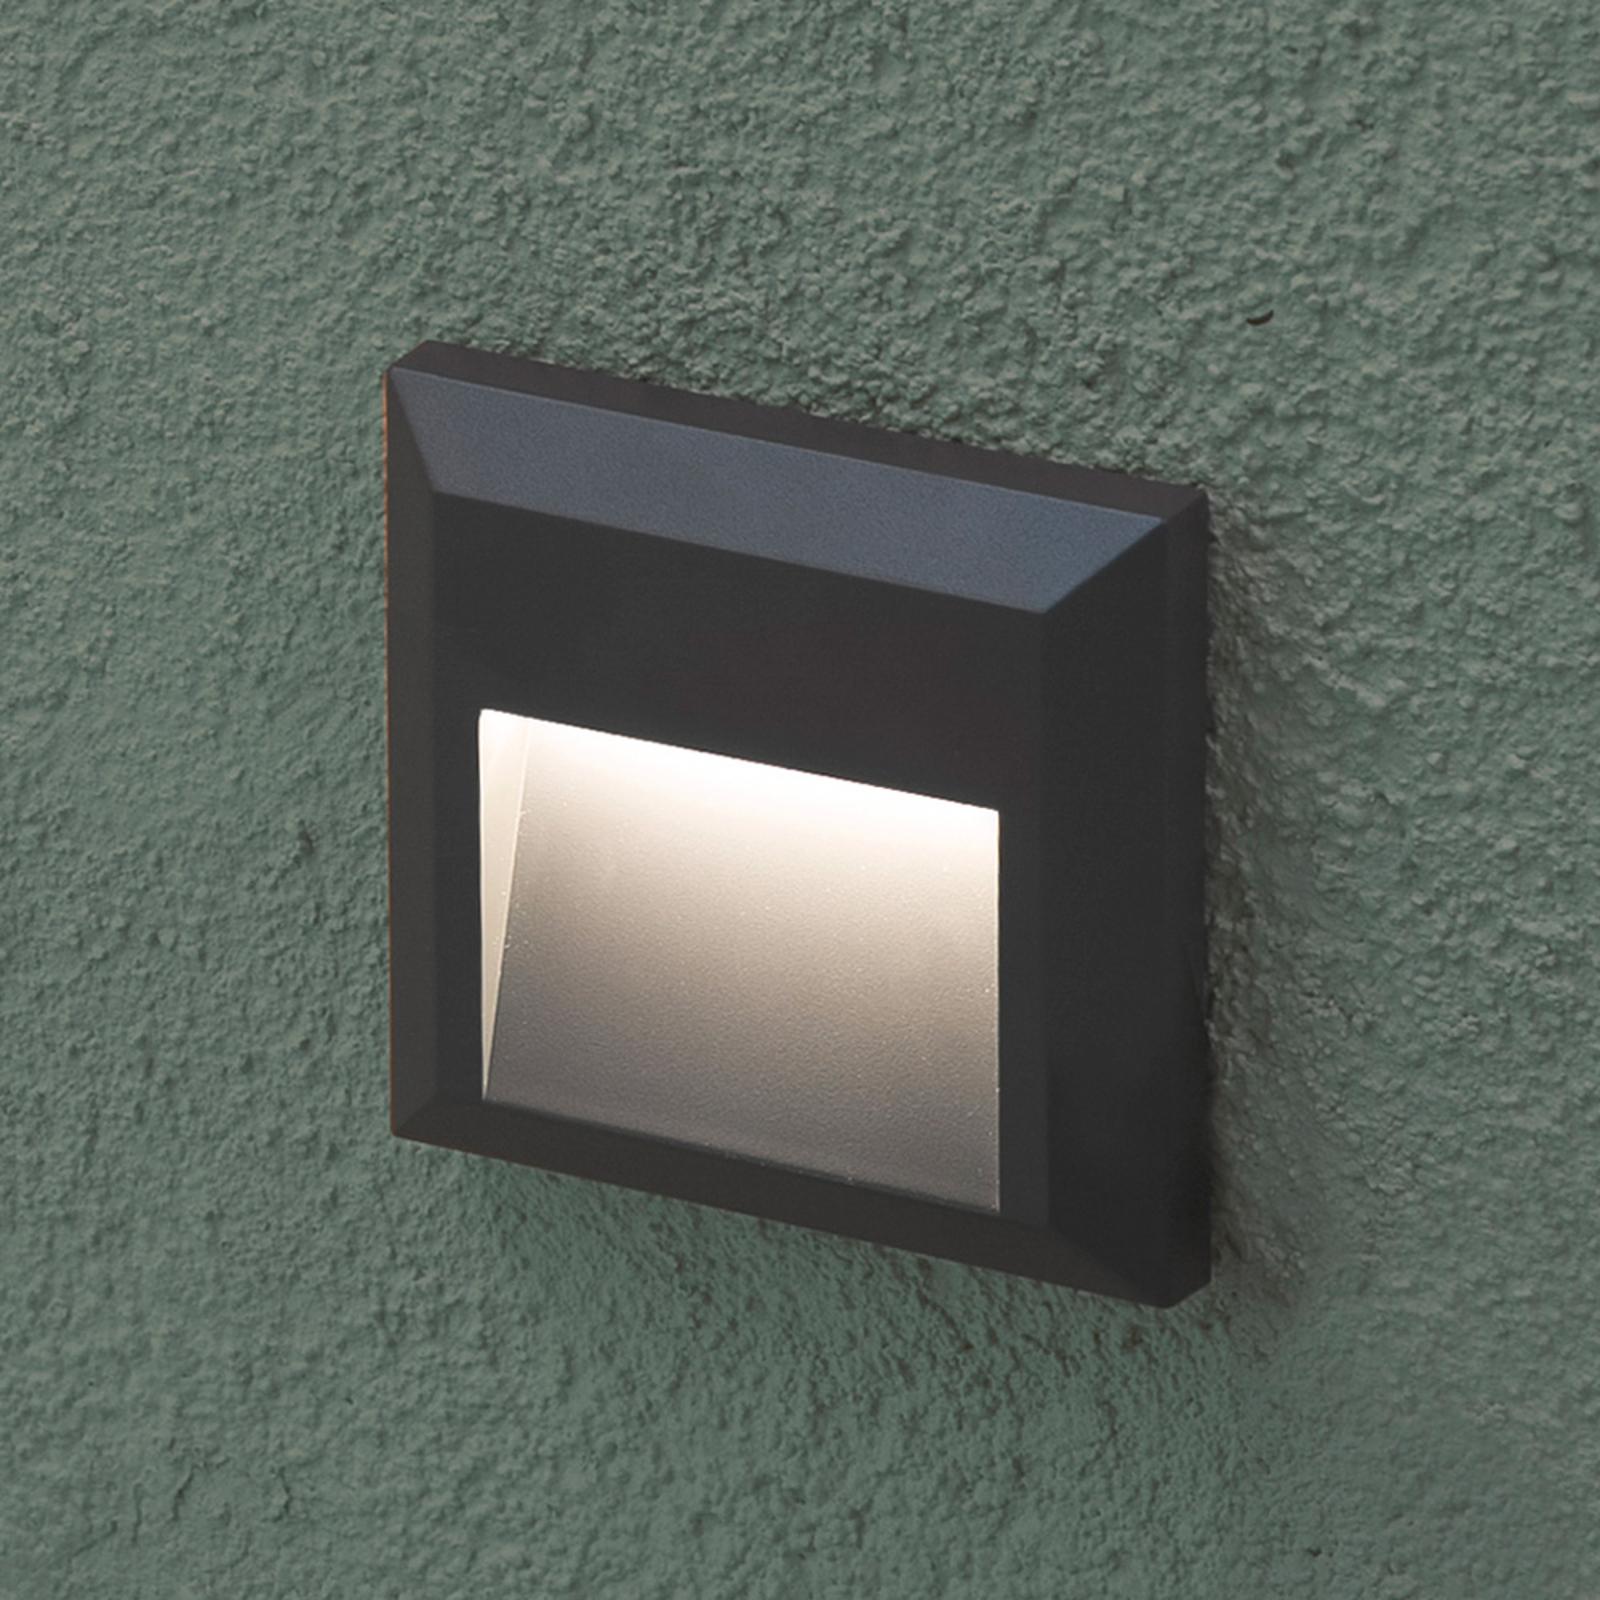 Grant - angular LED outdoor wall light_3505356_1